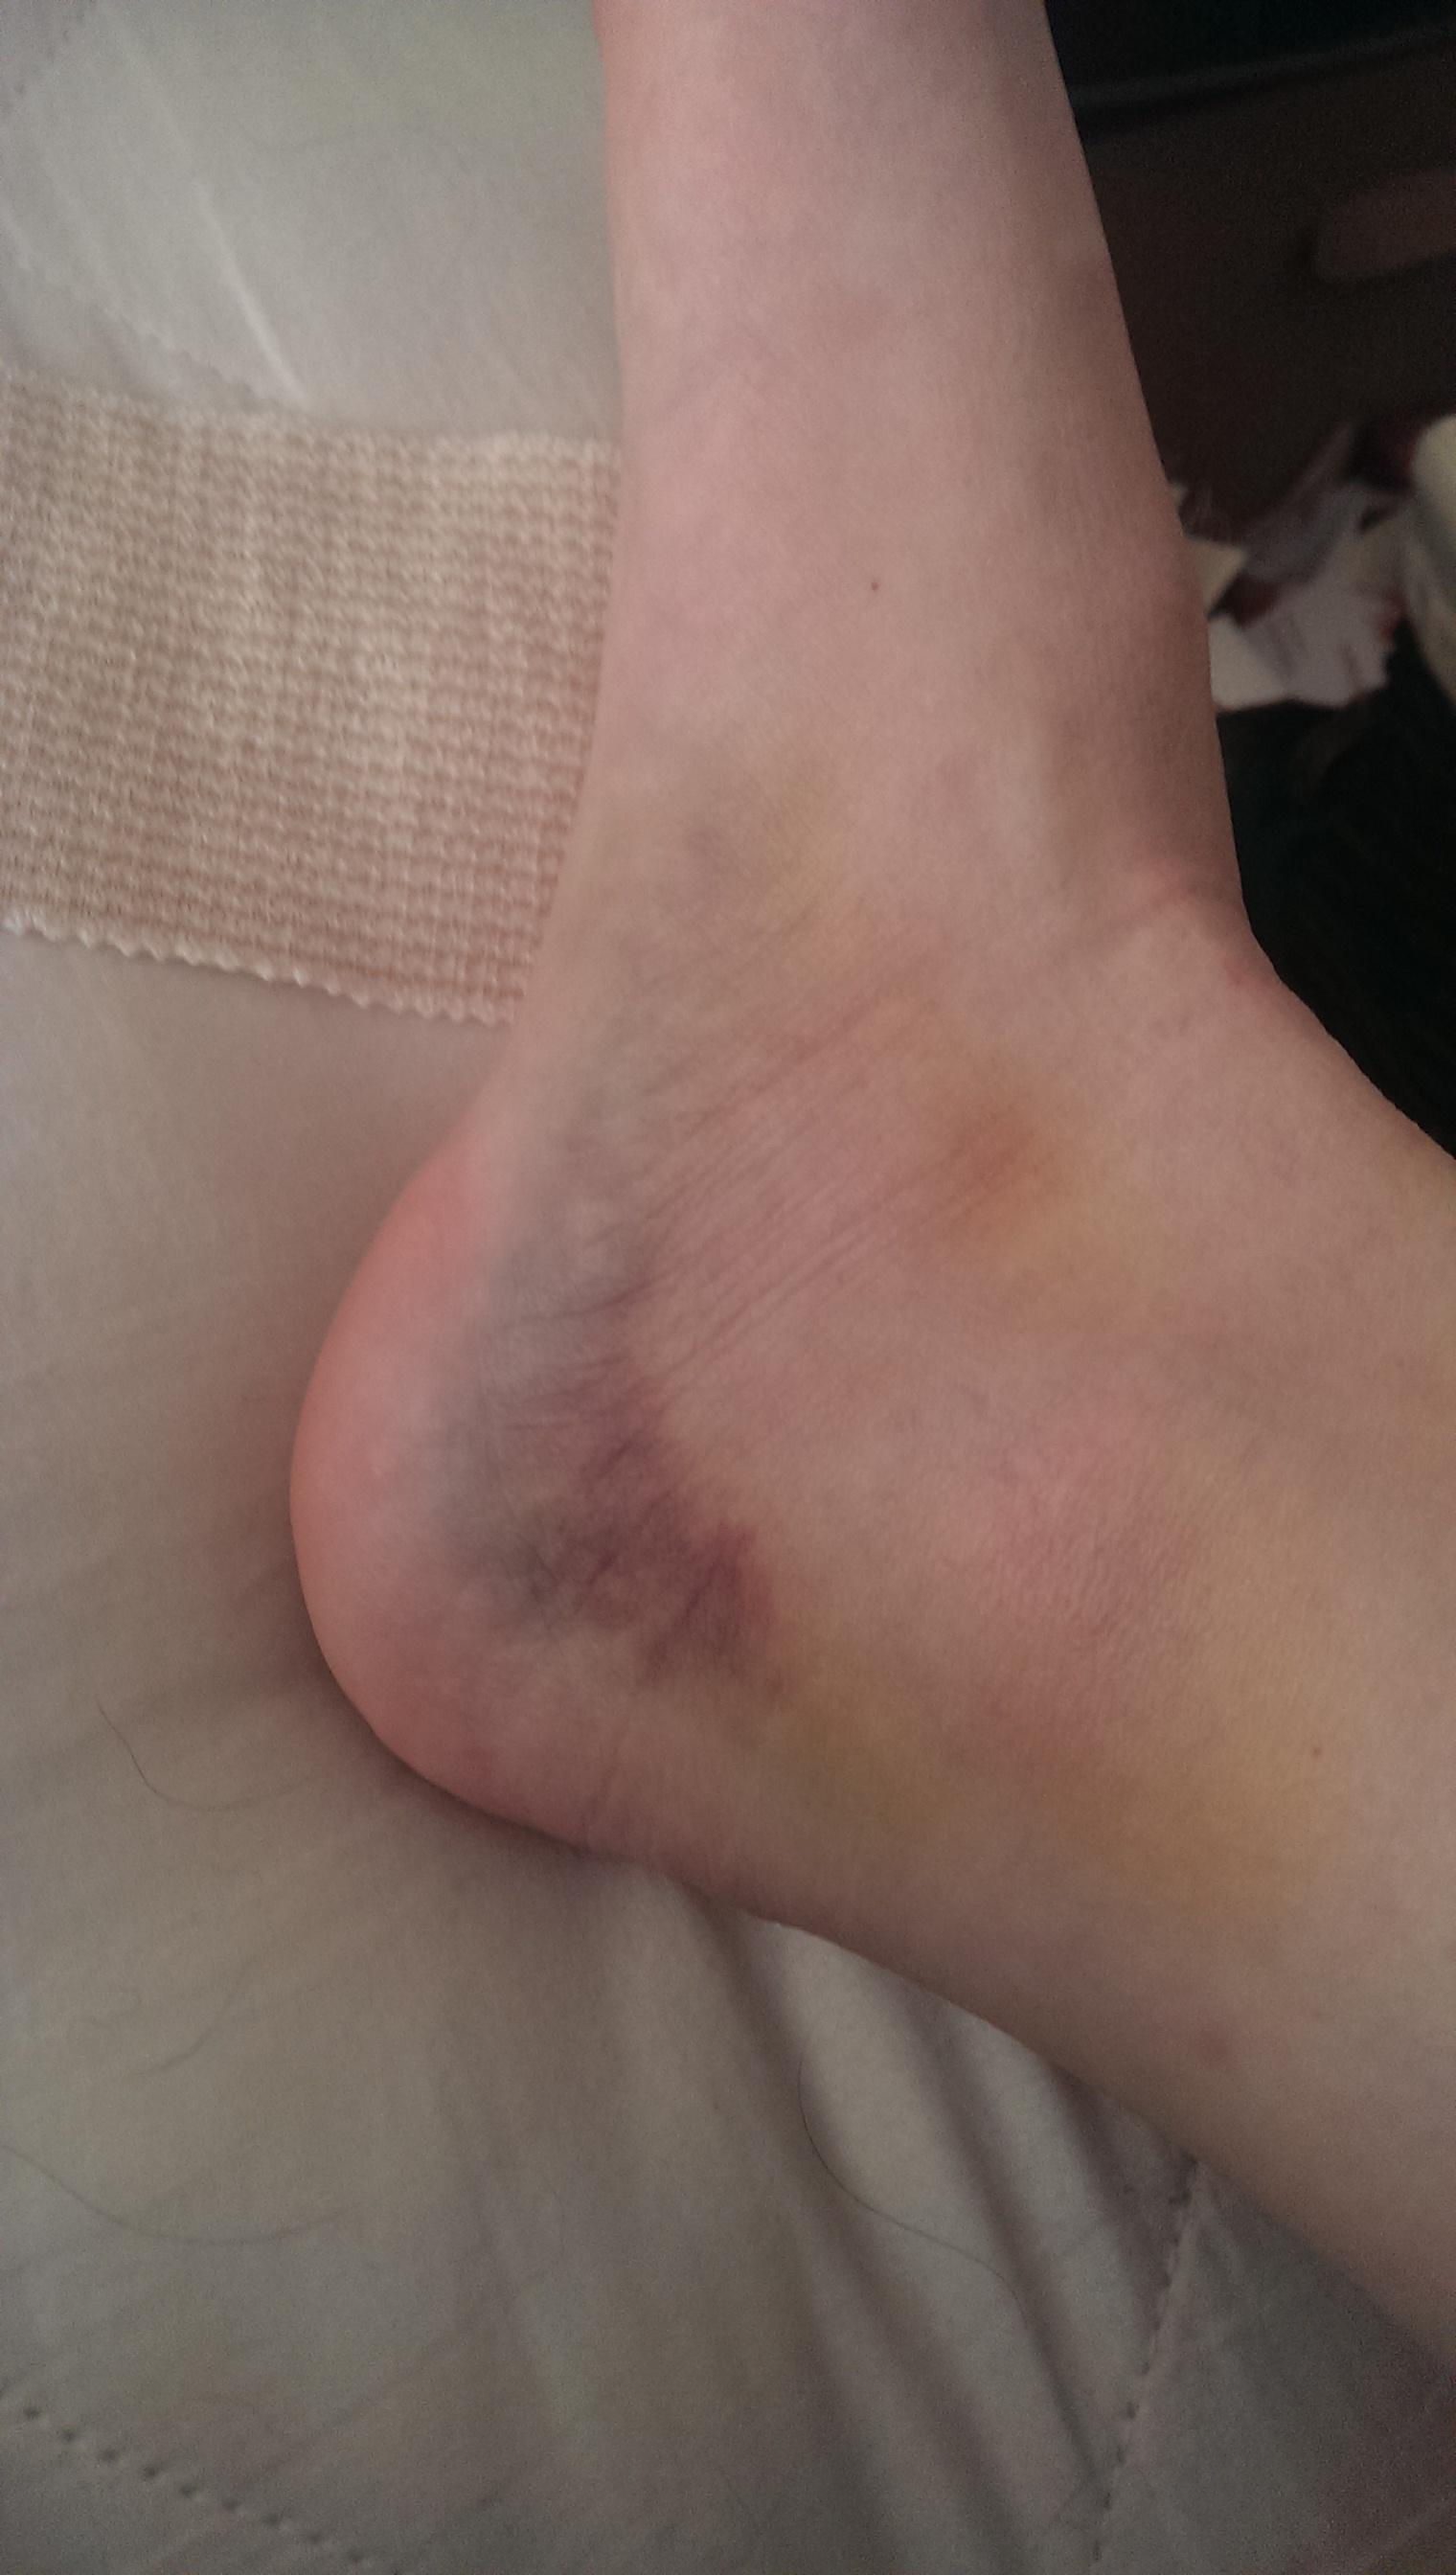 Ankle vs Step